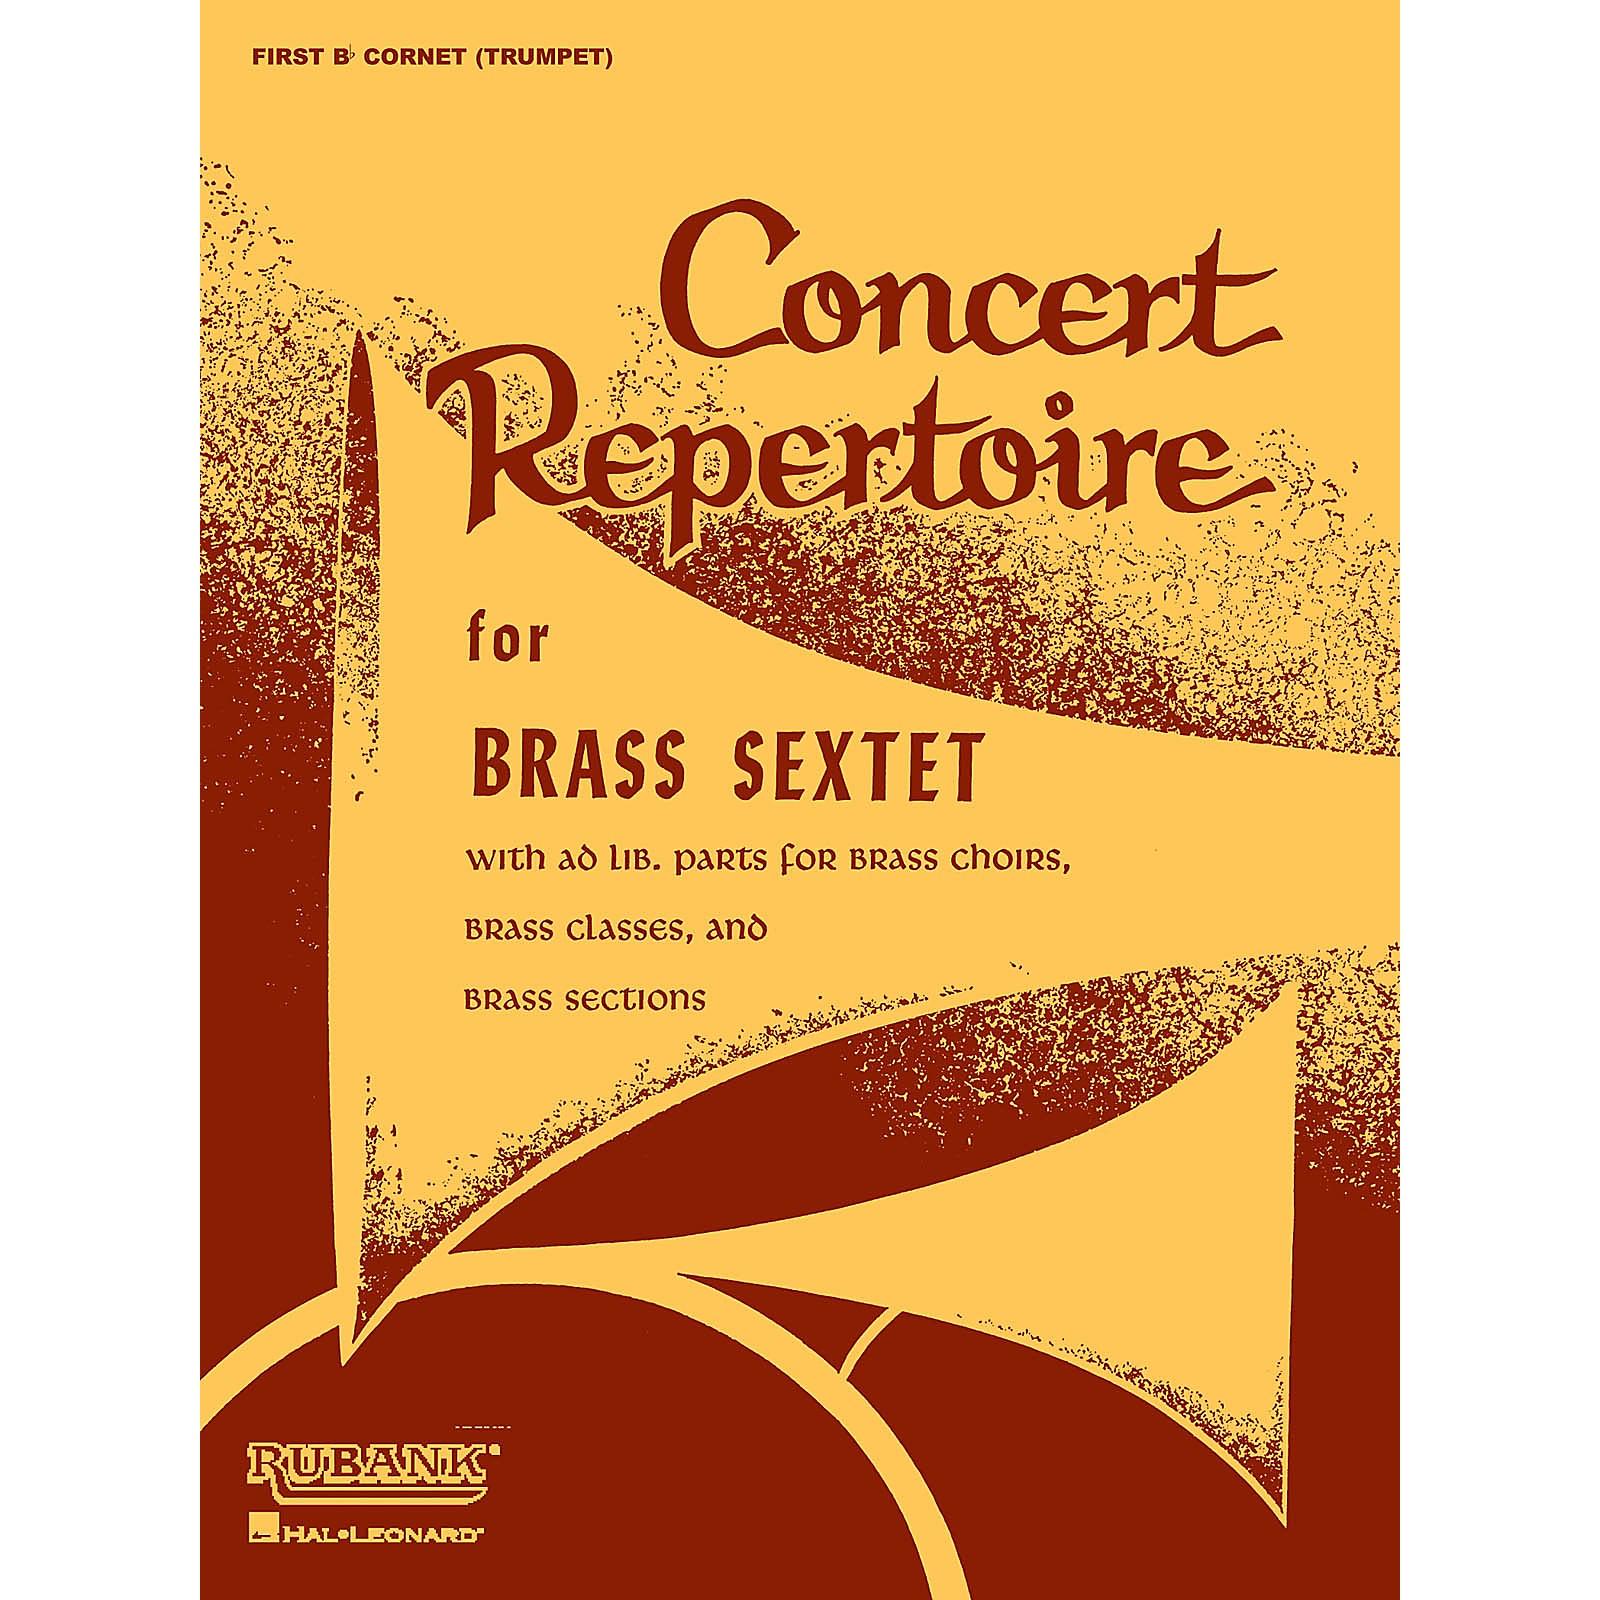 Rubank Publications Concert Repertoire for Brass Sextet (6th Part - Bass/Tuba (B.C.)) Ensemble Collection Series